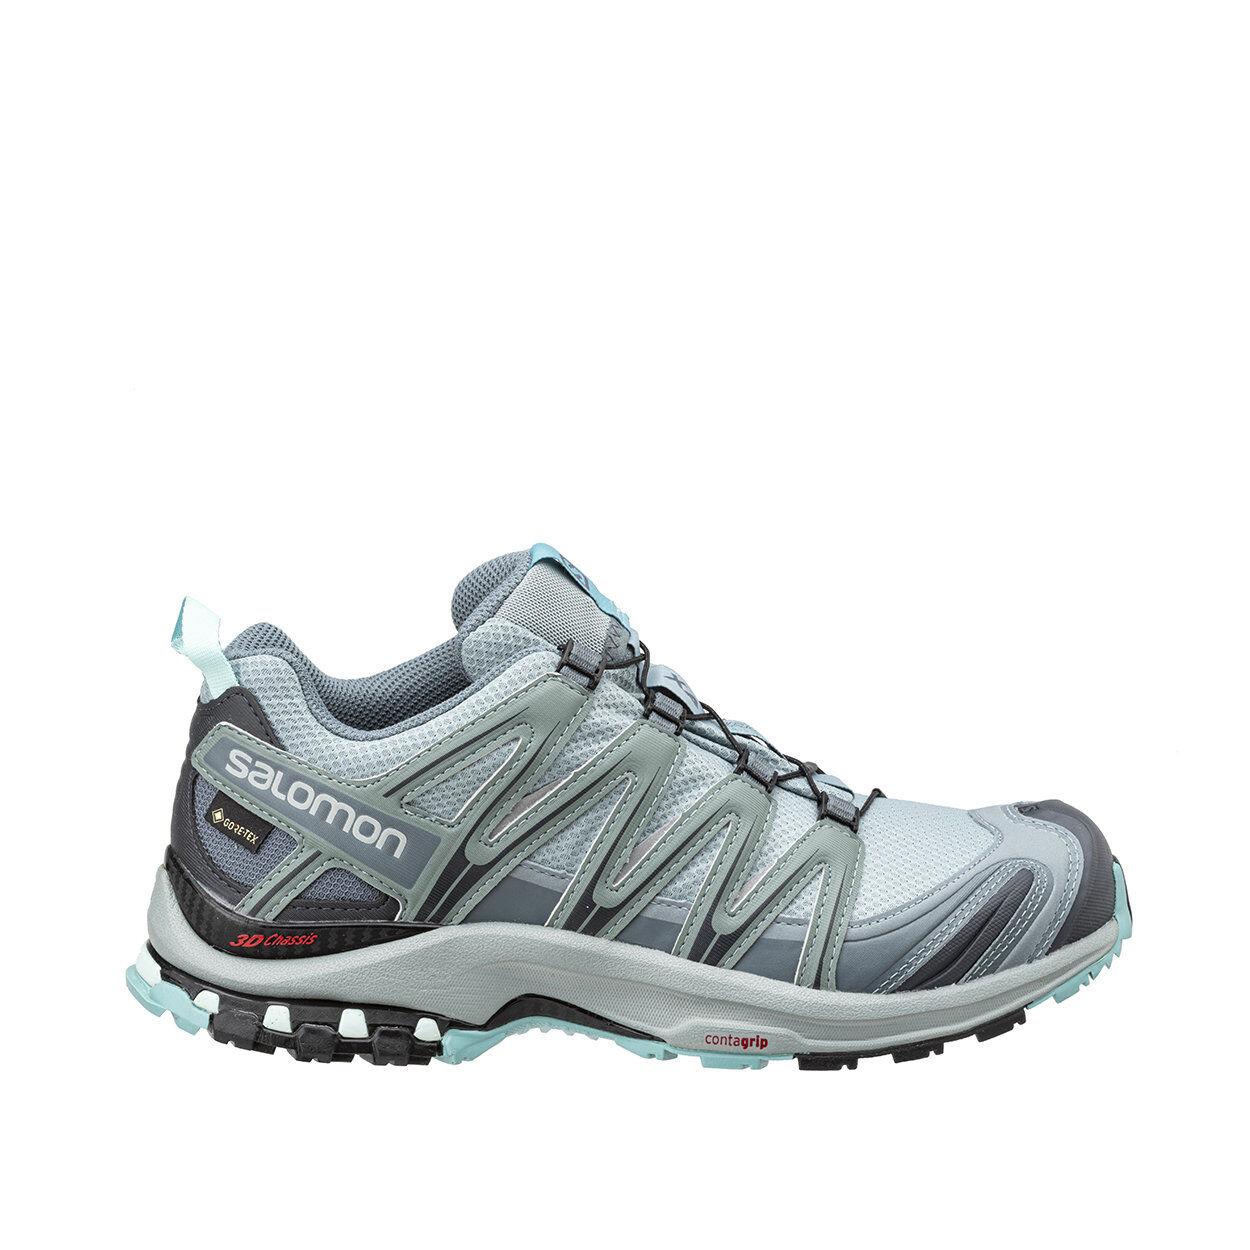 salomon xa pro 3d gtx - scarpe trail running verde acqua ed azzurro